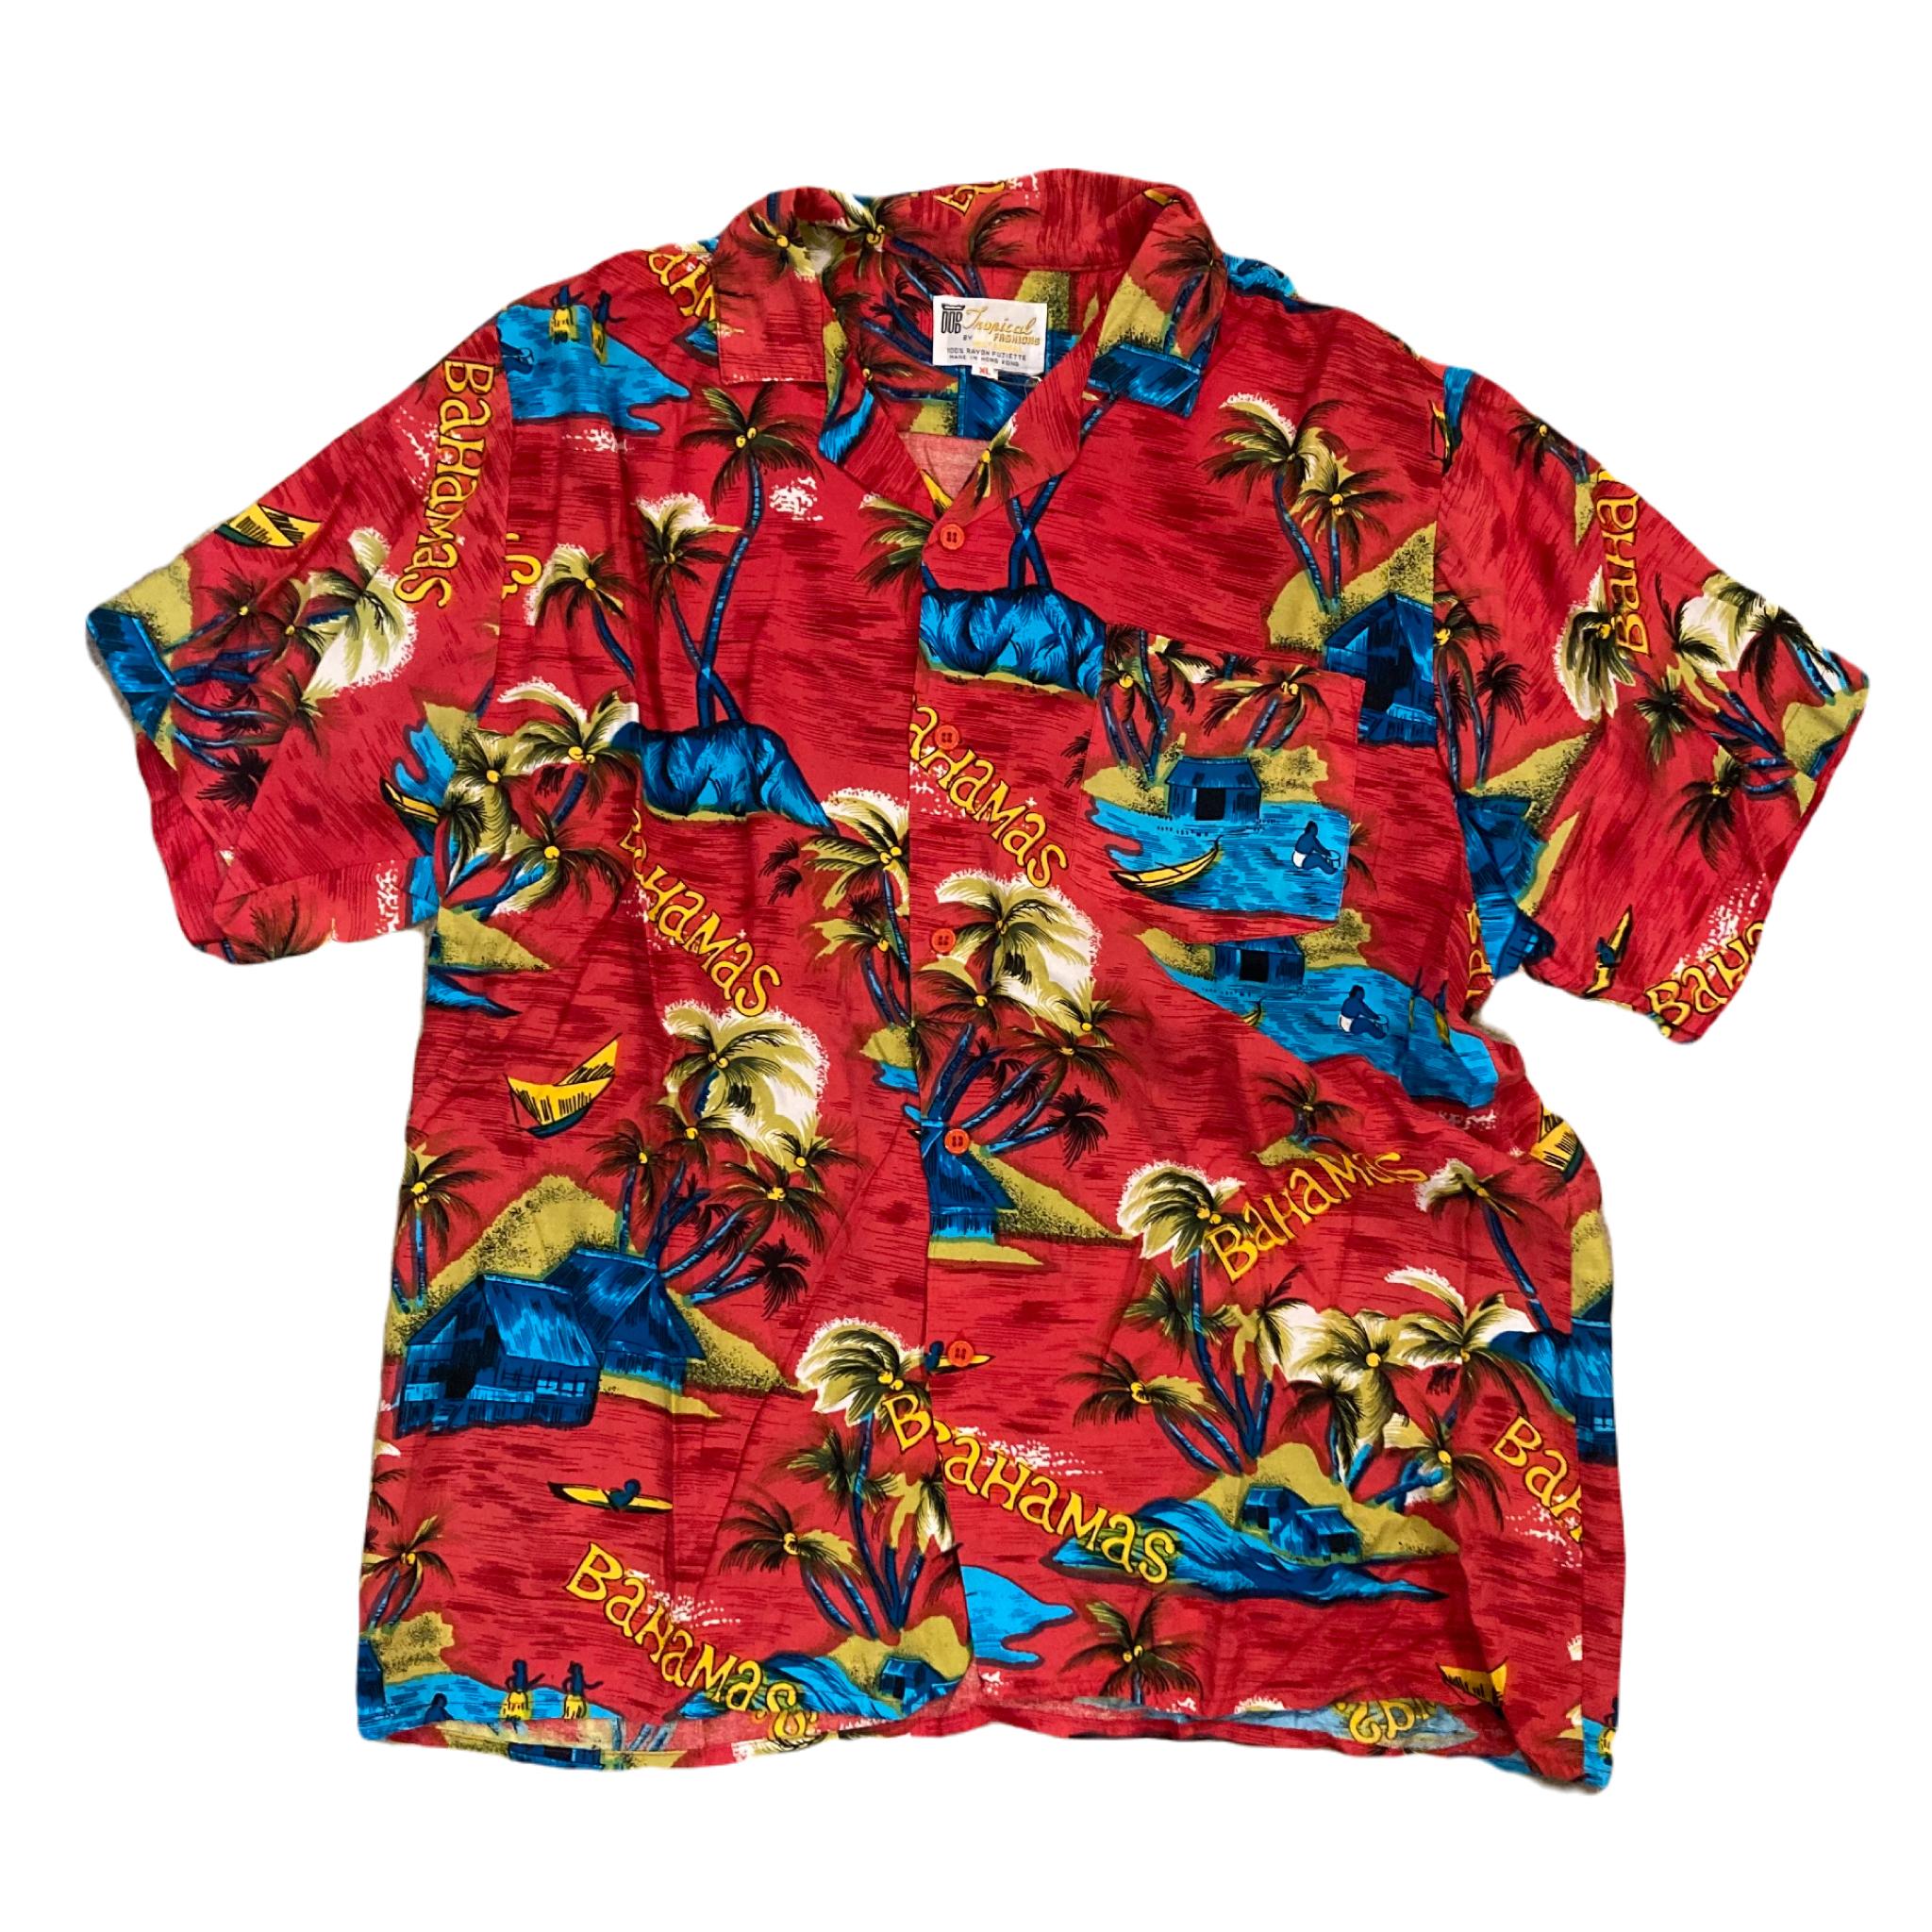 Tropical Fashion By Watanmal Bahamas Aloha Shirts ¥6,300+tax